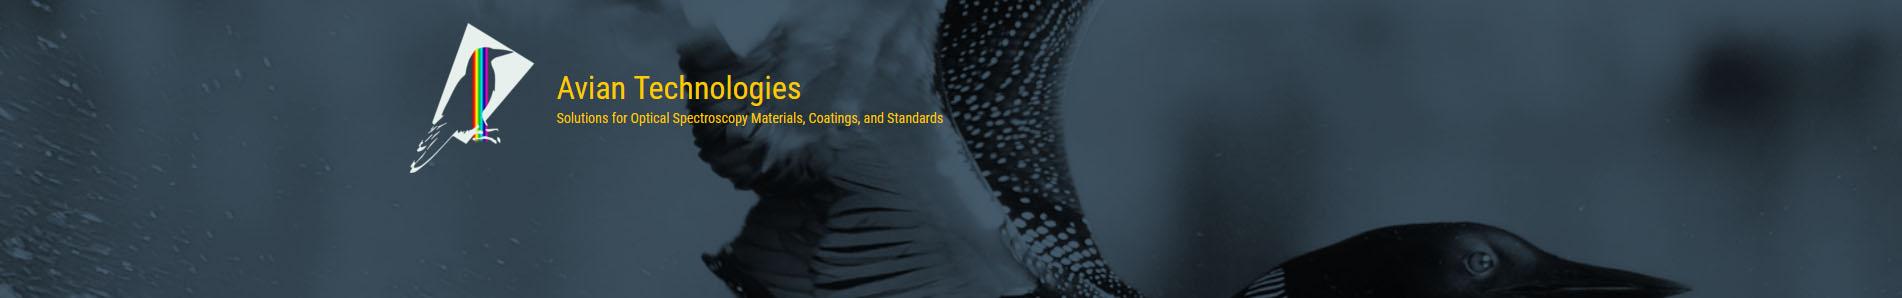 Avian banner LCI